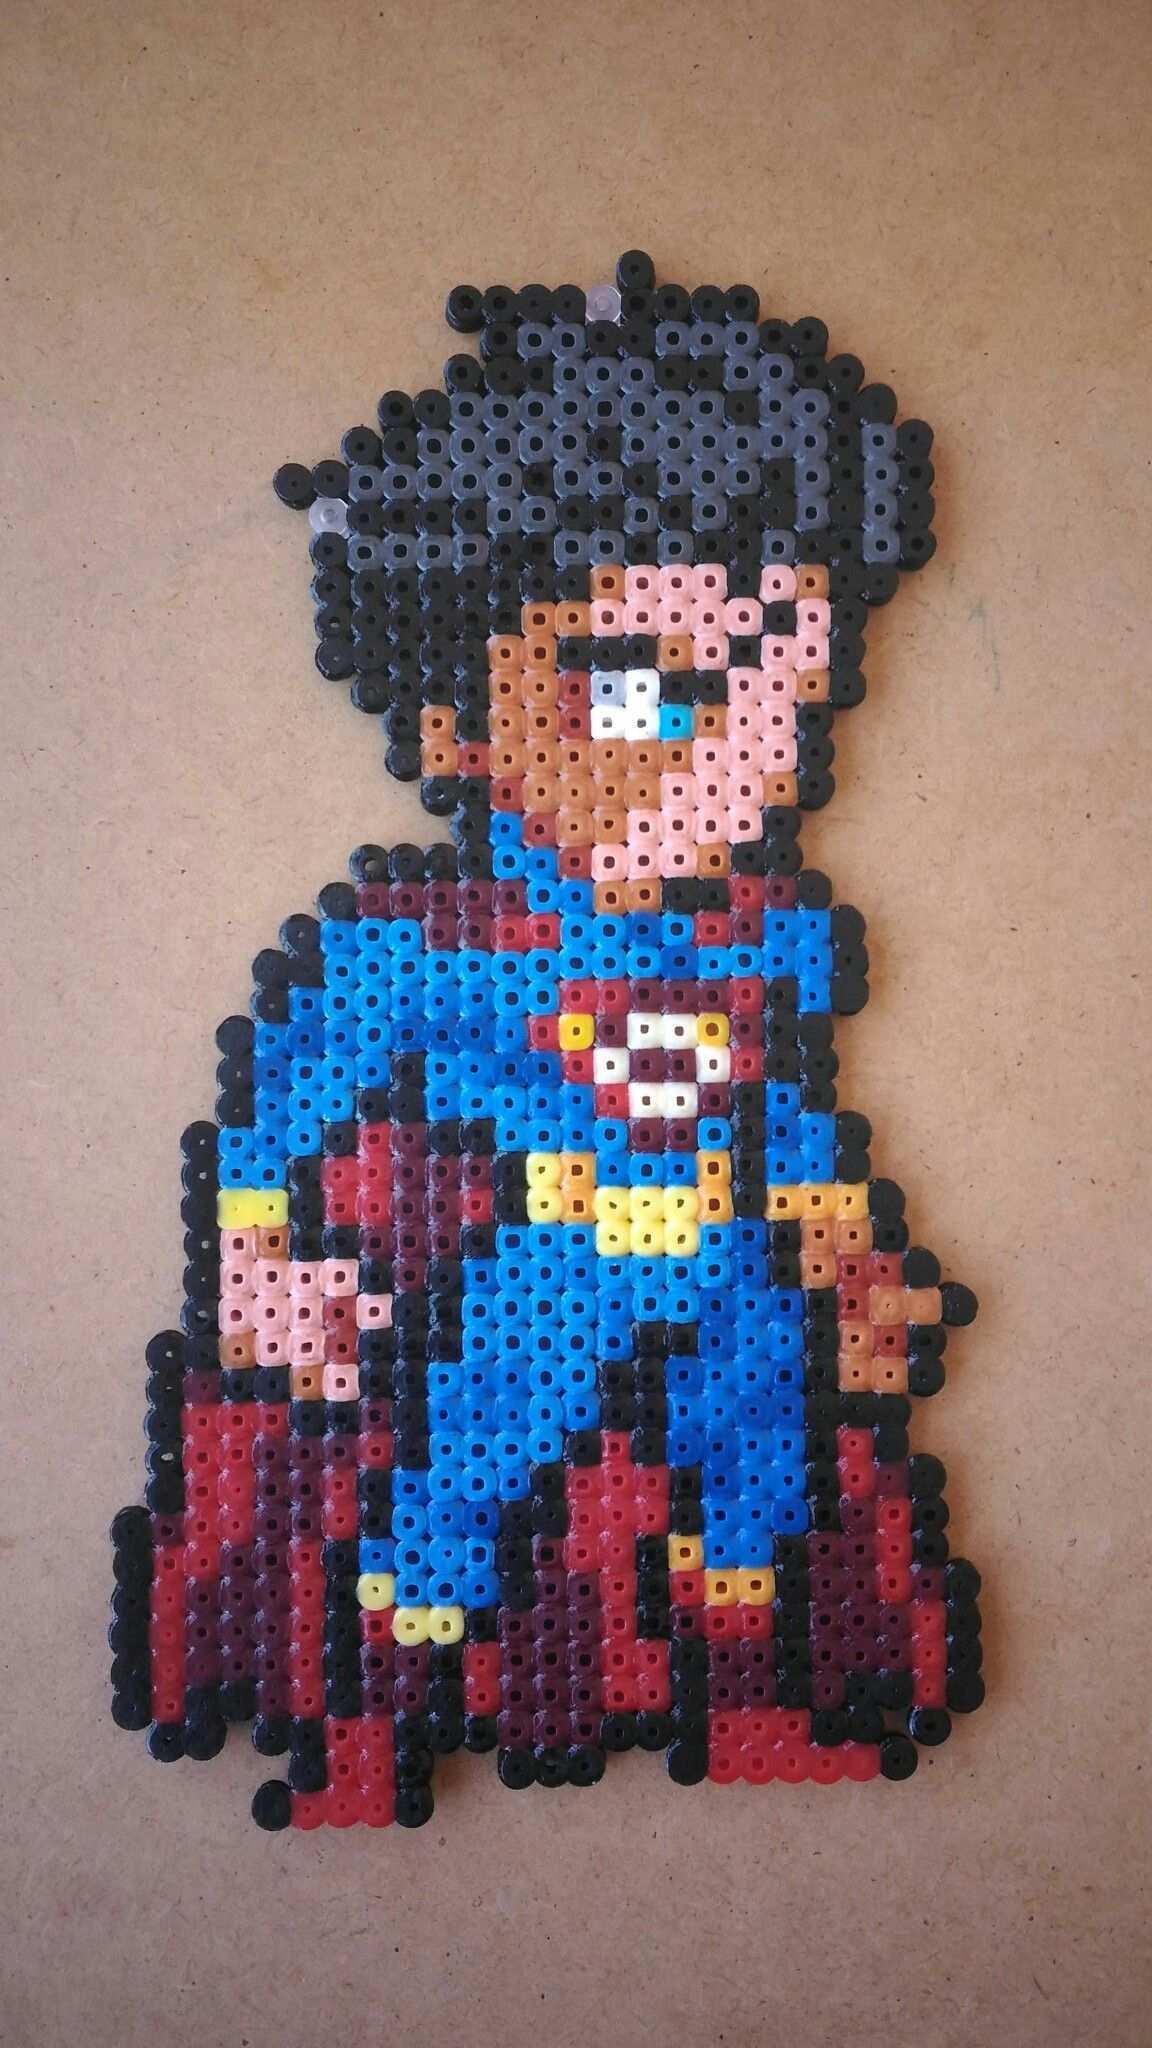 Superman Liga De La Justicia Perler Beads Hama Beads Design Perler Bead Art Pixel Art Grid